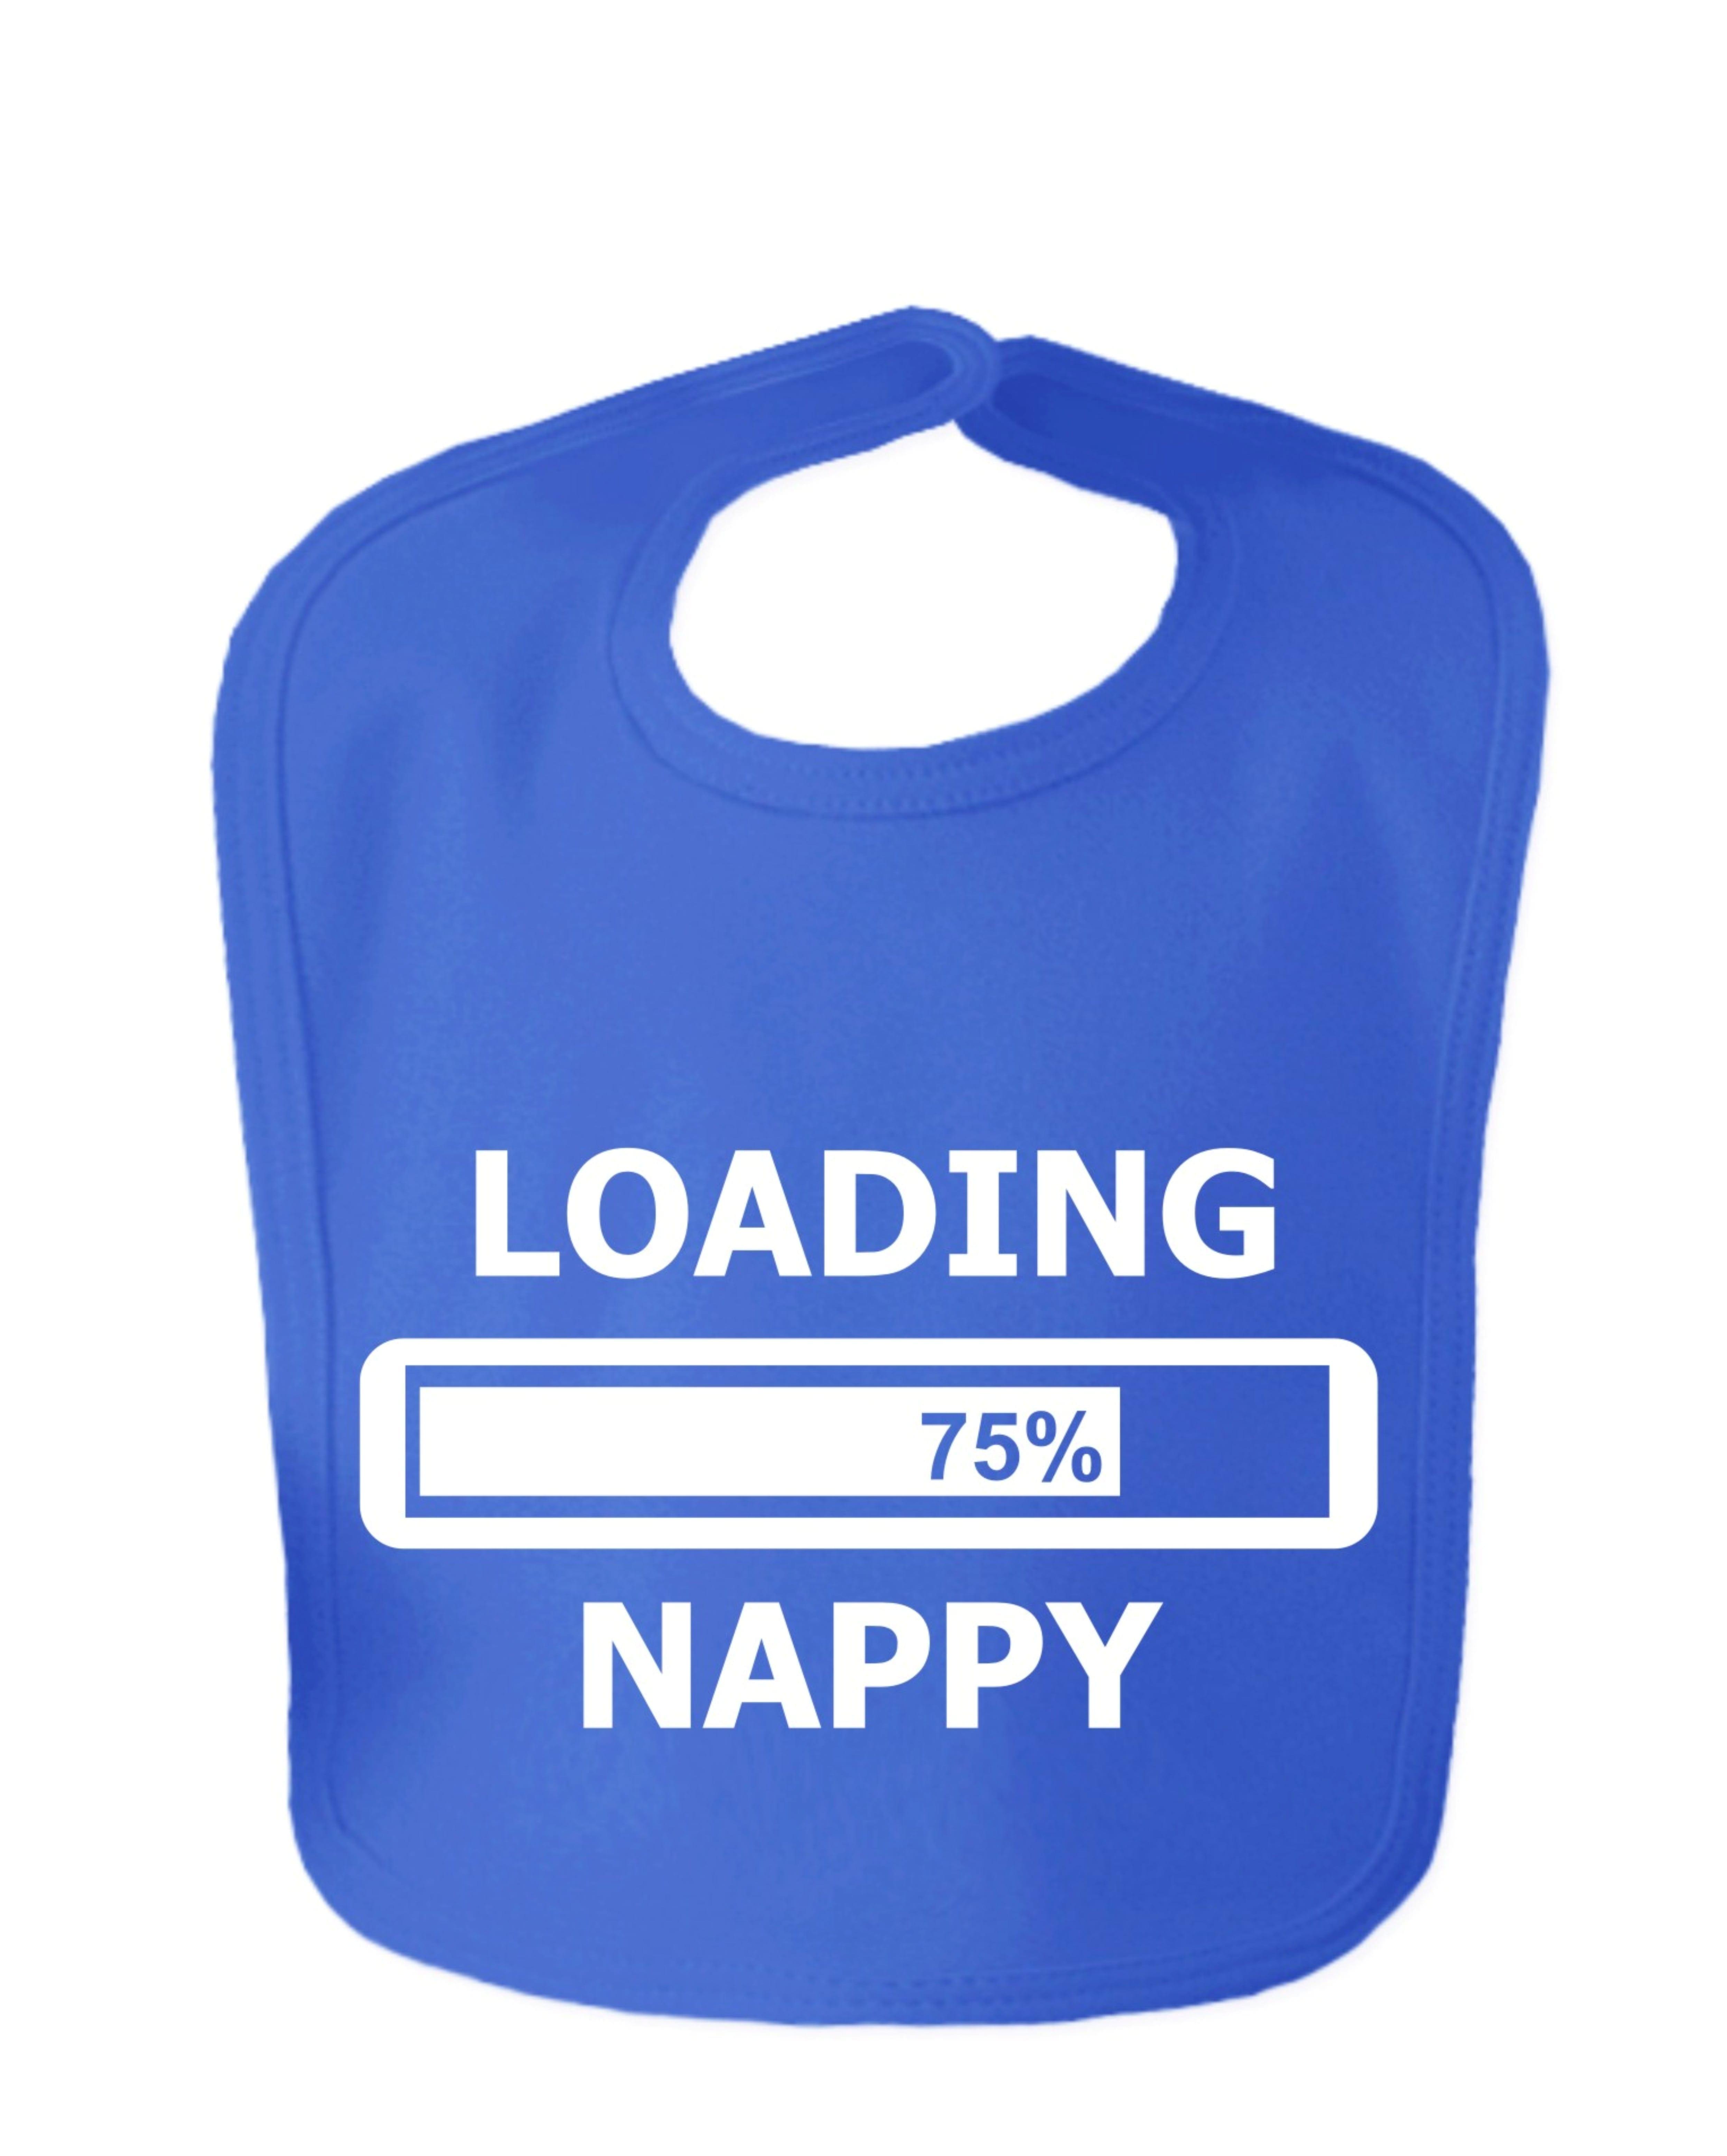 Royal Blue Loading Nappy Velcro Bib